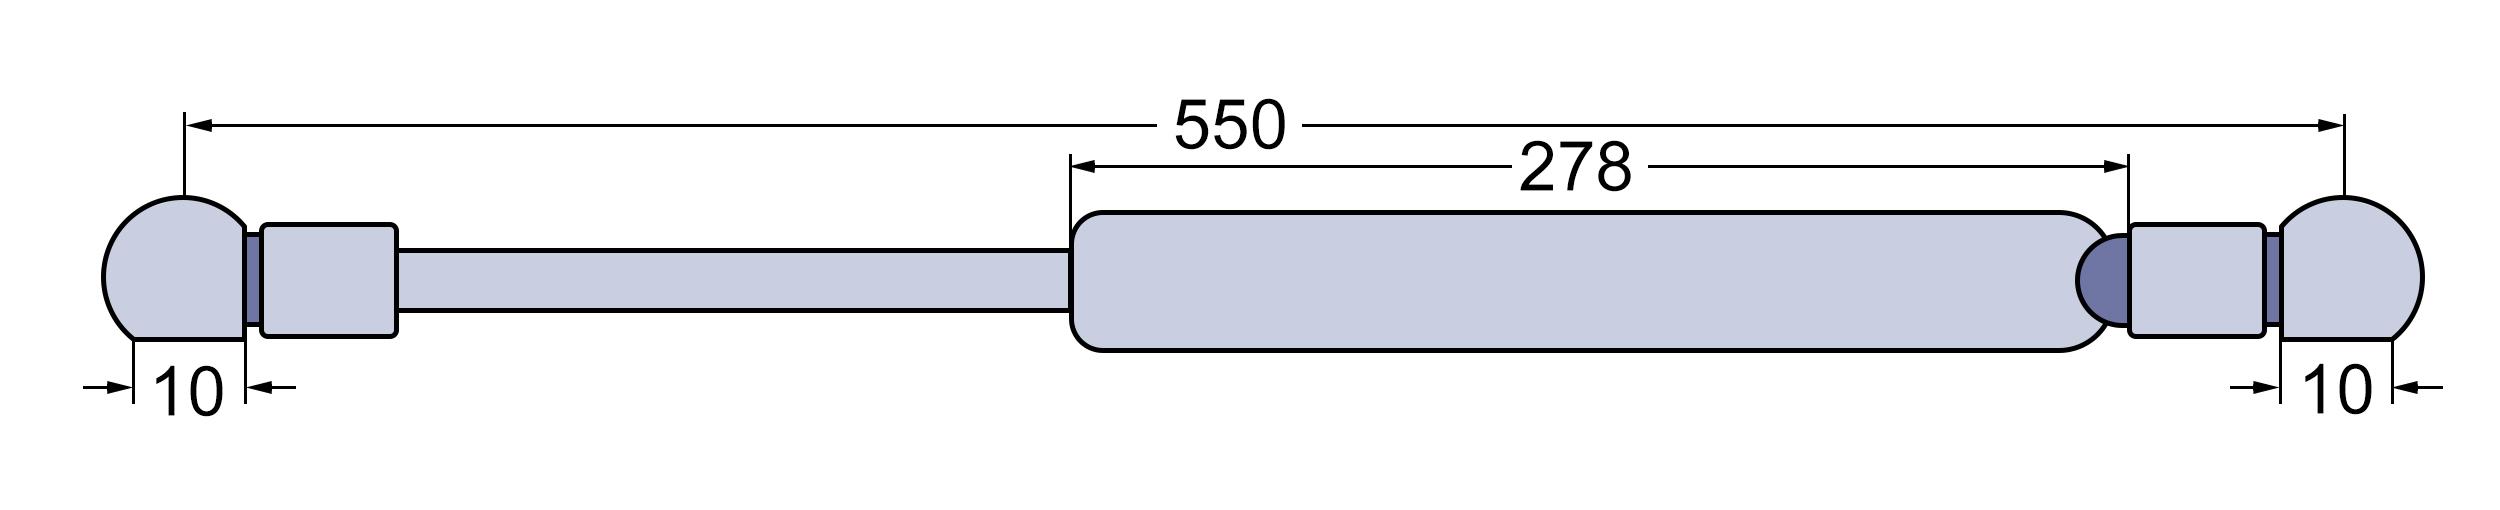 10Pcs 2.5mm 9-Point Plum Golden Tip 33.35mm Length Spring Test Probes Pin P125-H